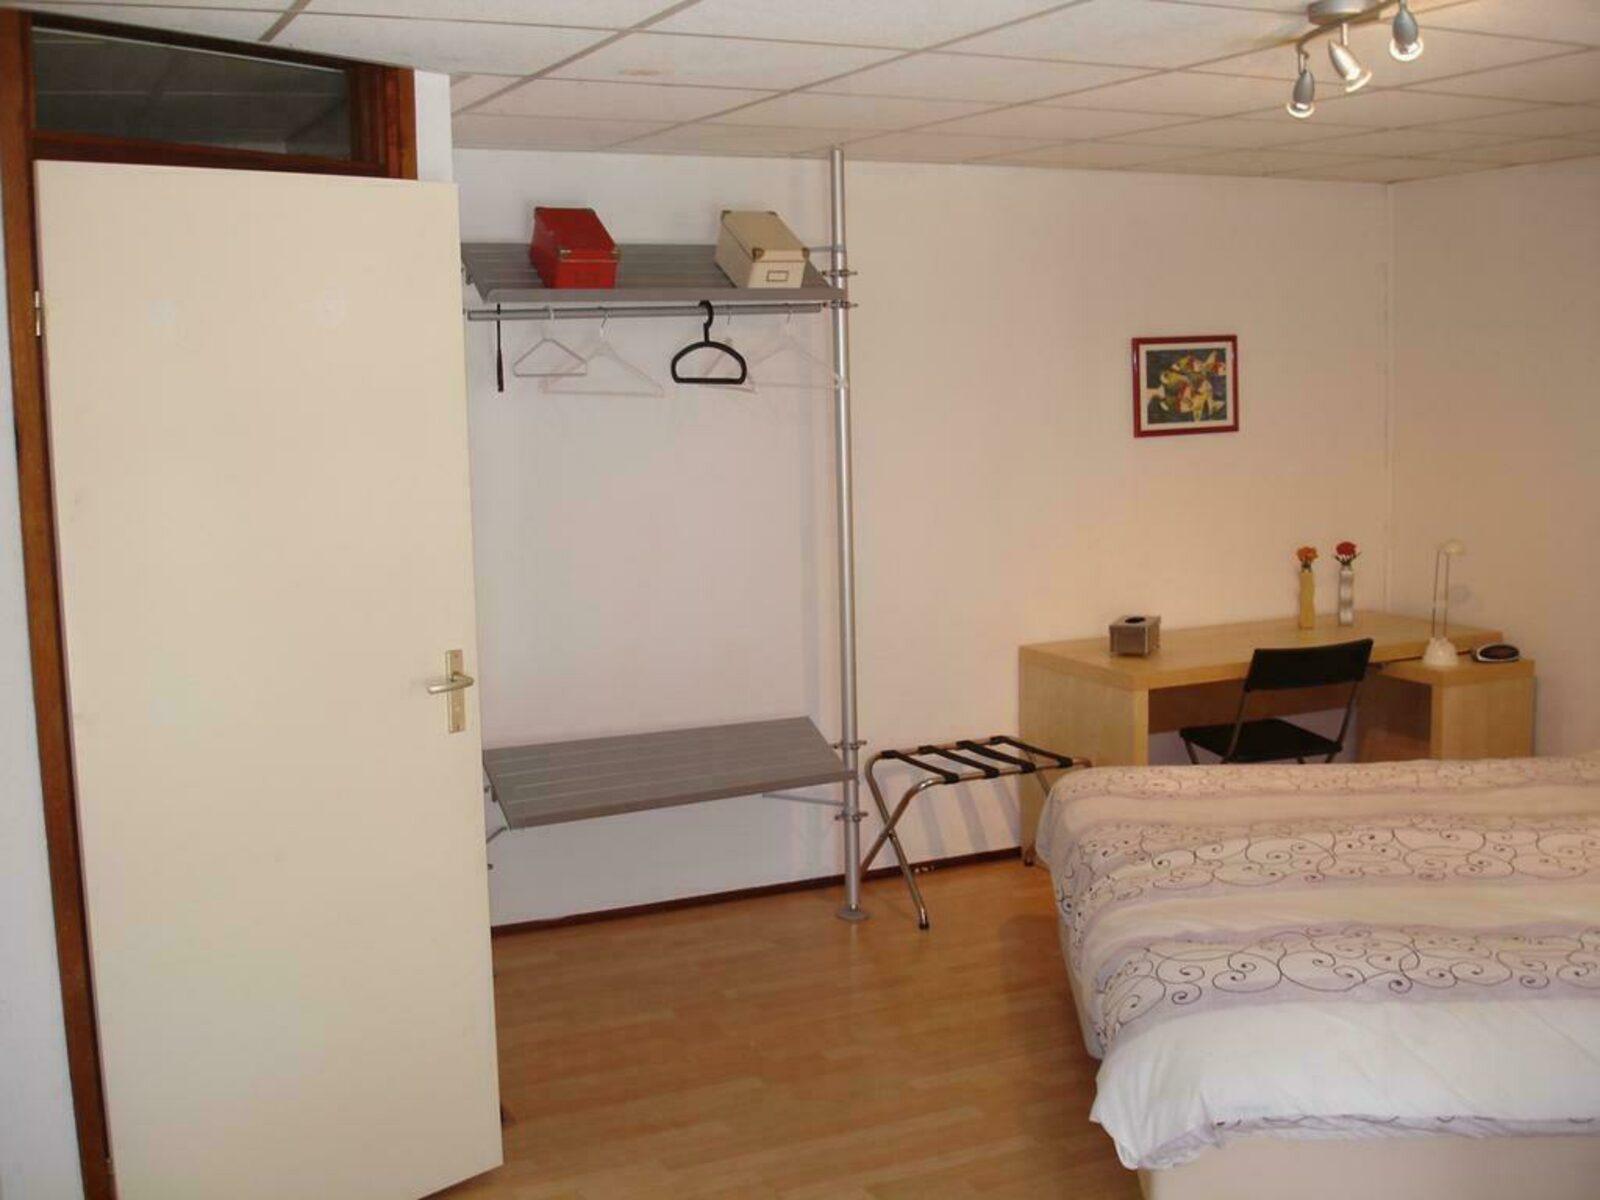 Motelroom